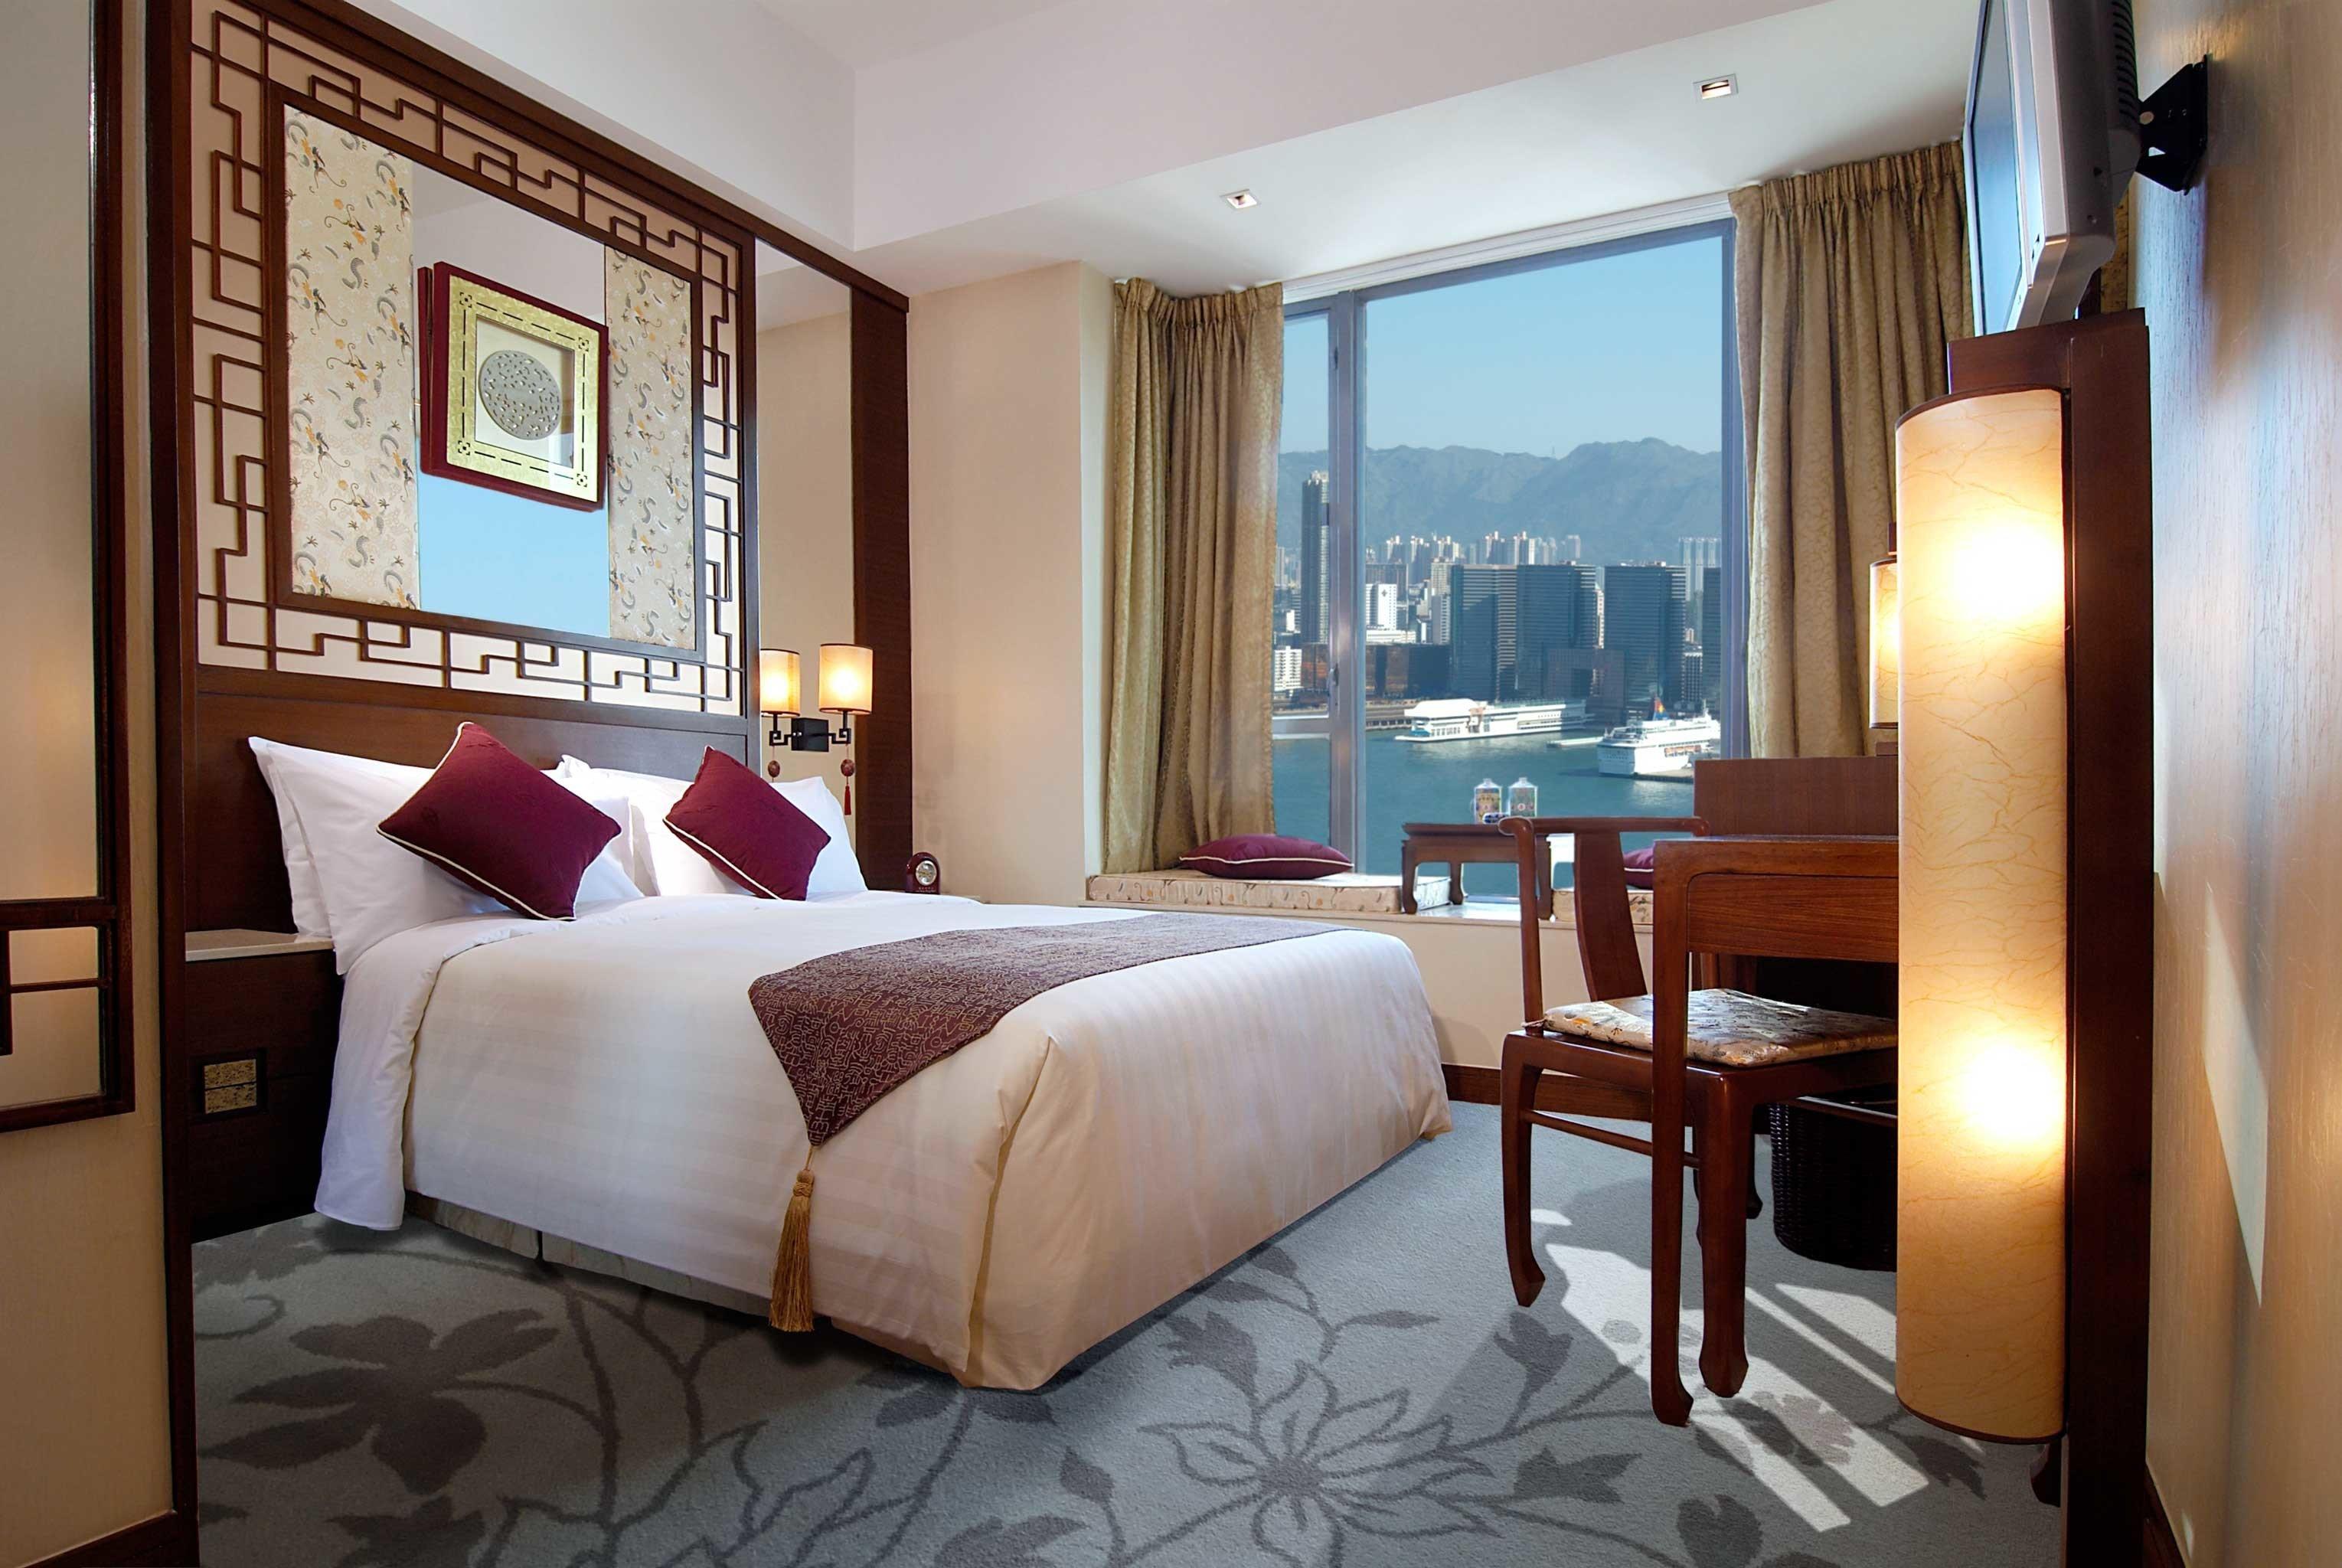 Bedroom City Lounge Scenic views Suite sofa property cottage condominium Resort Villa